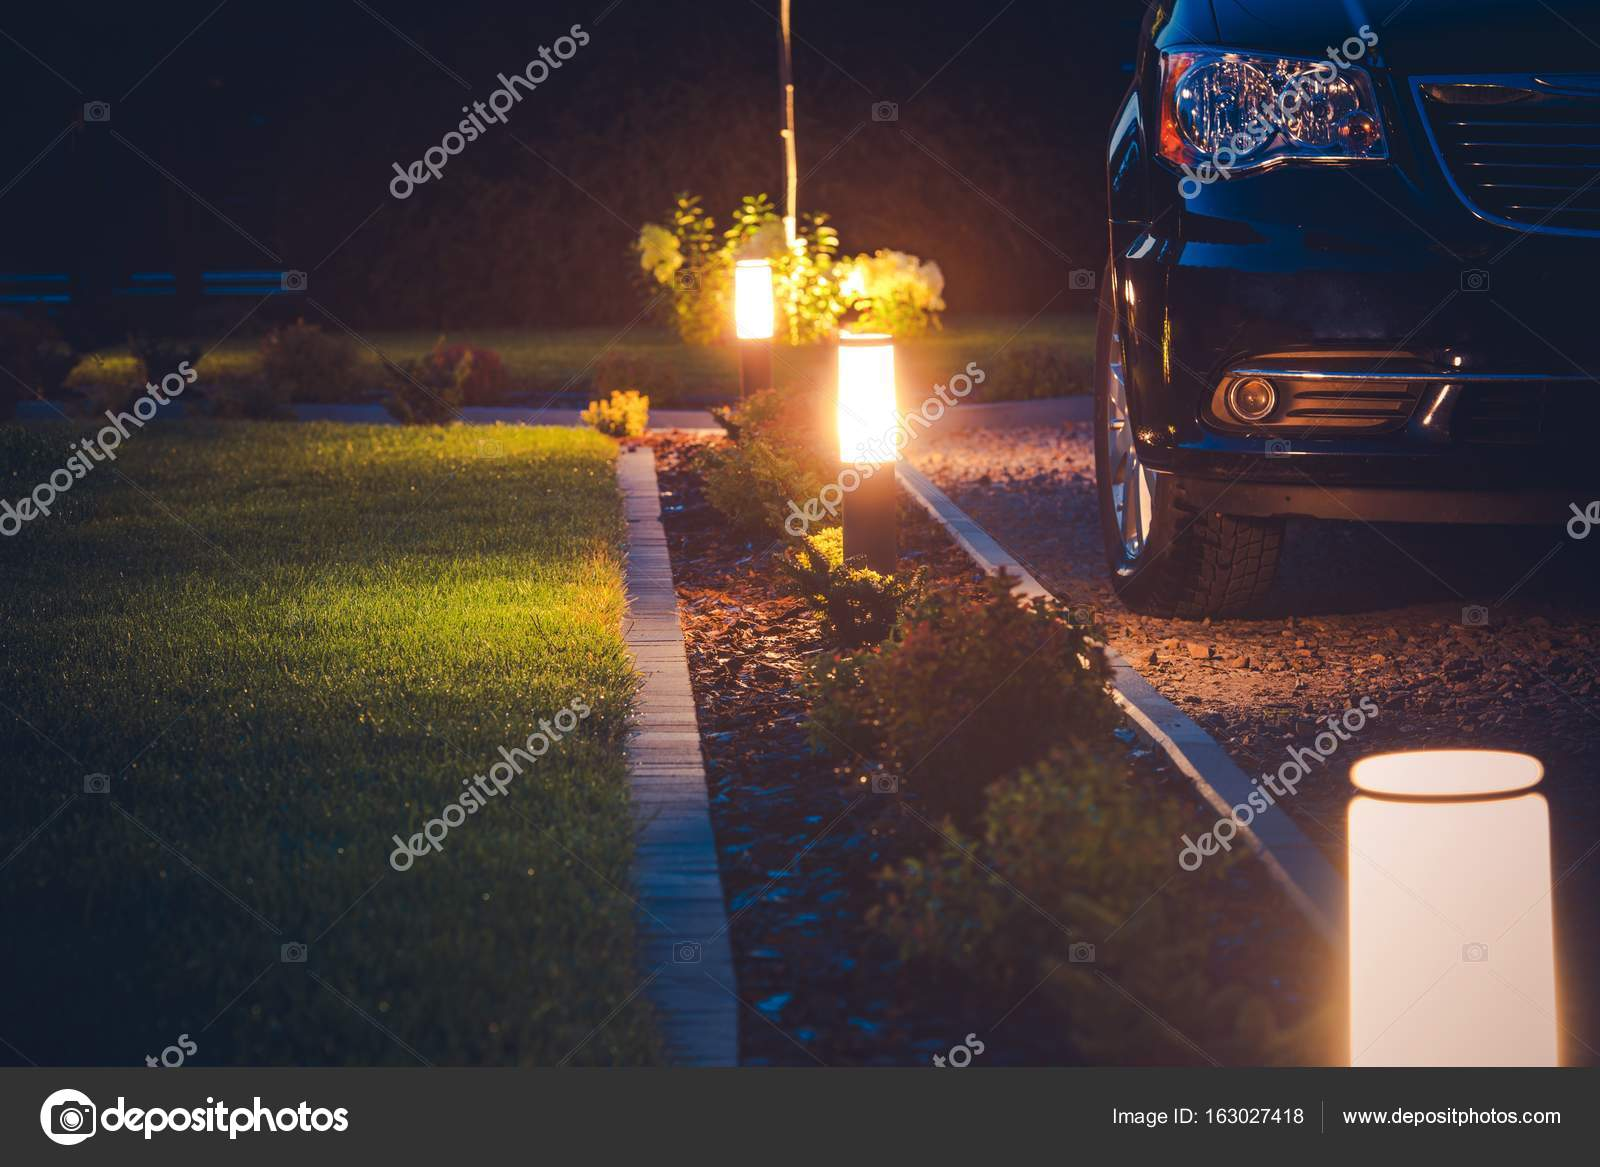 Huis oprit verlichting — Stockfoto © welcomia #163027418